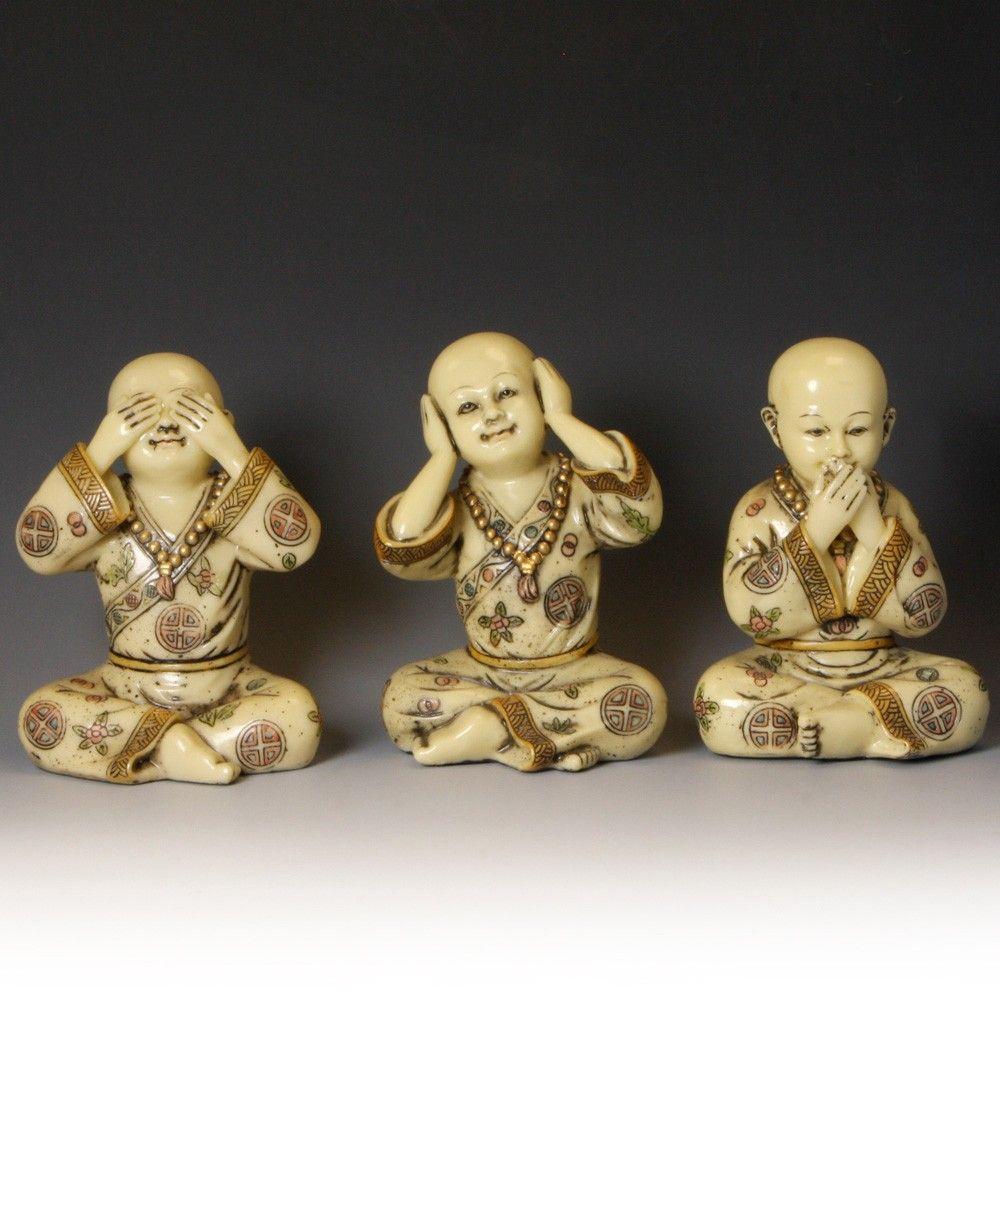 Set of 3 Baby Buddhist Monk Statues: See No Evil, Hear No Evil, Say No Evil